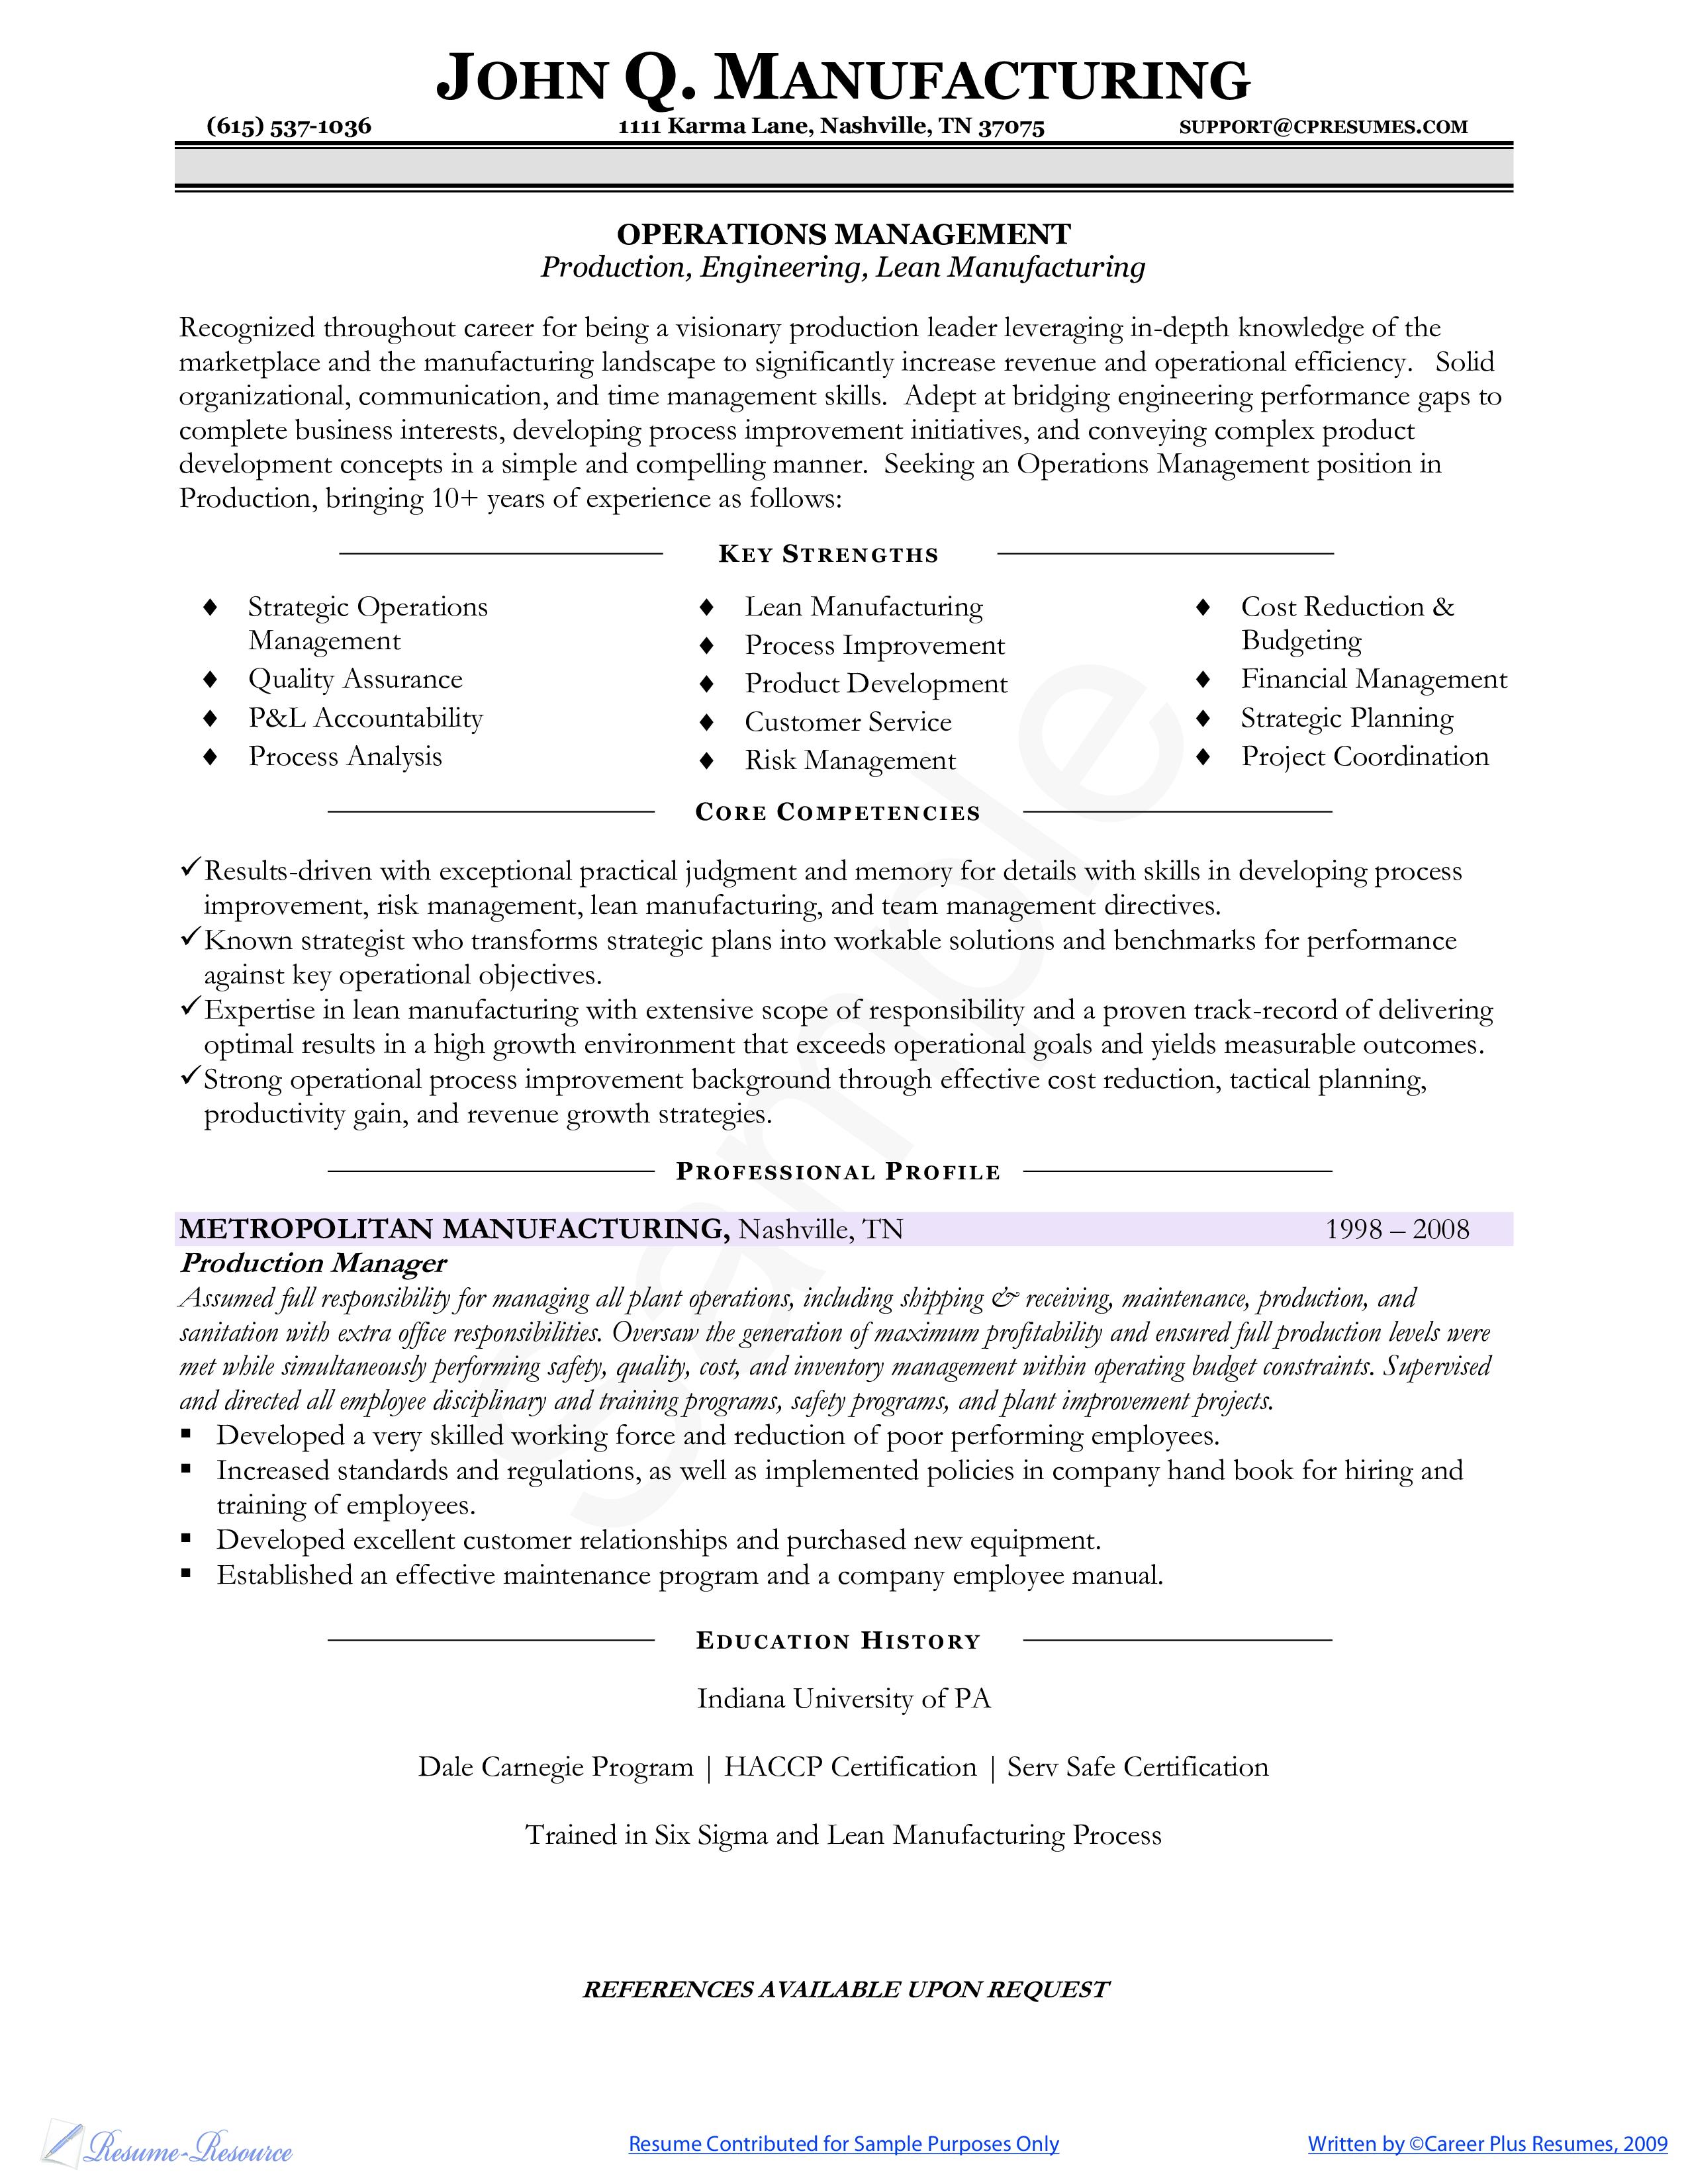 exman10.pdf - exman10.pdf. Easy to download and use .pdf Business ...